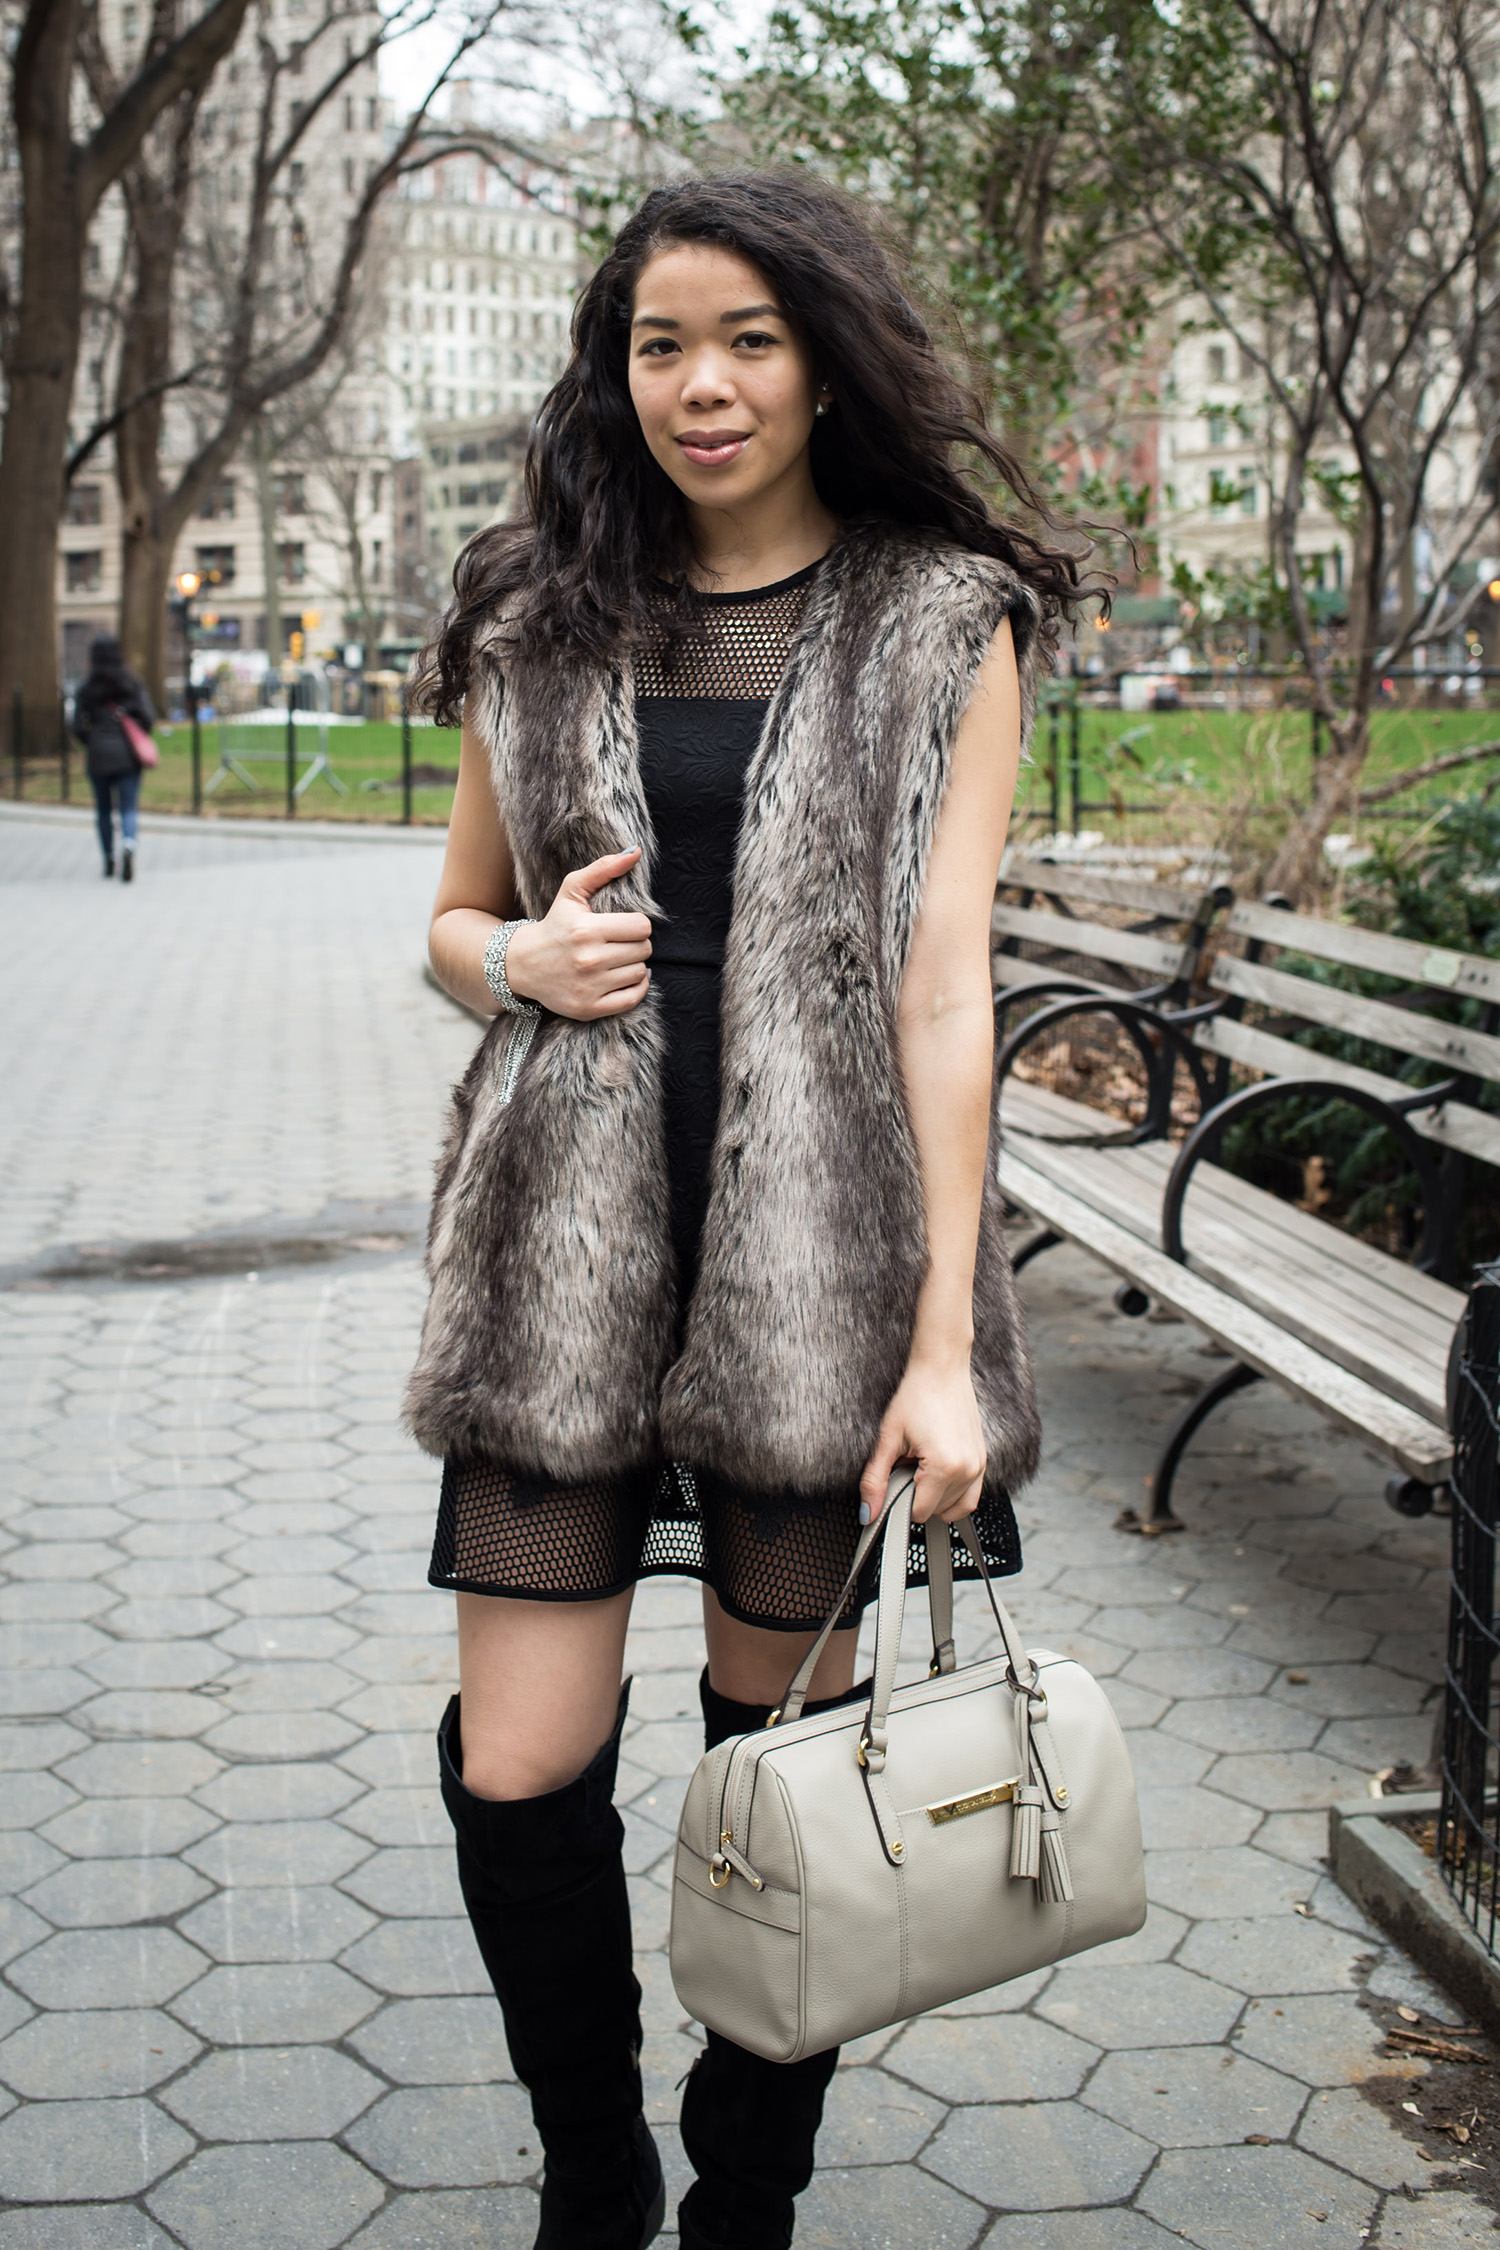 black-appliqu-fit-and-flare-dress.jpg